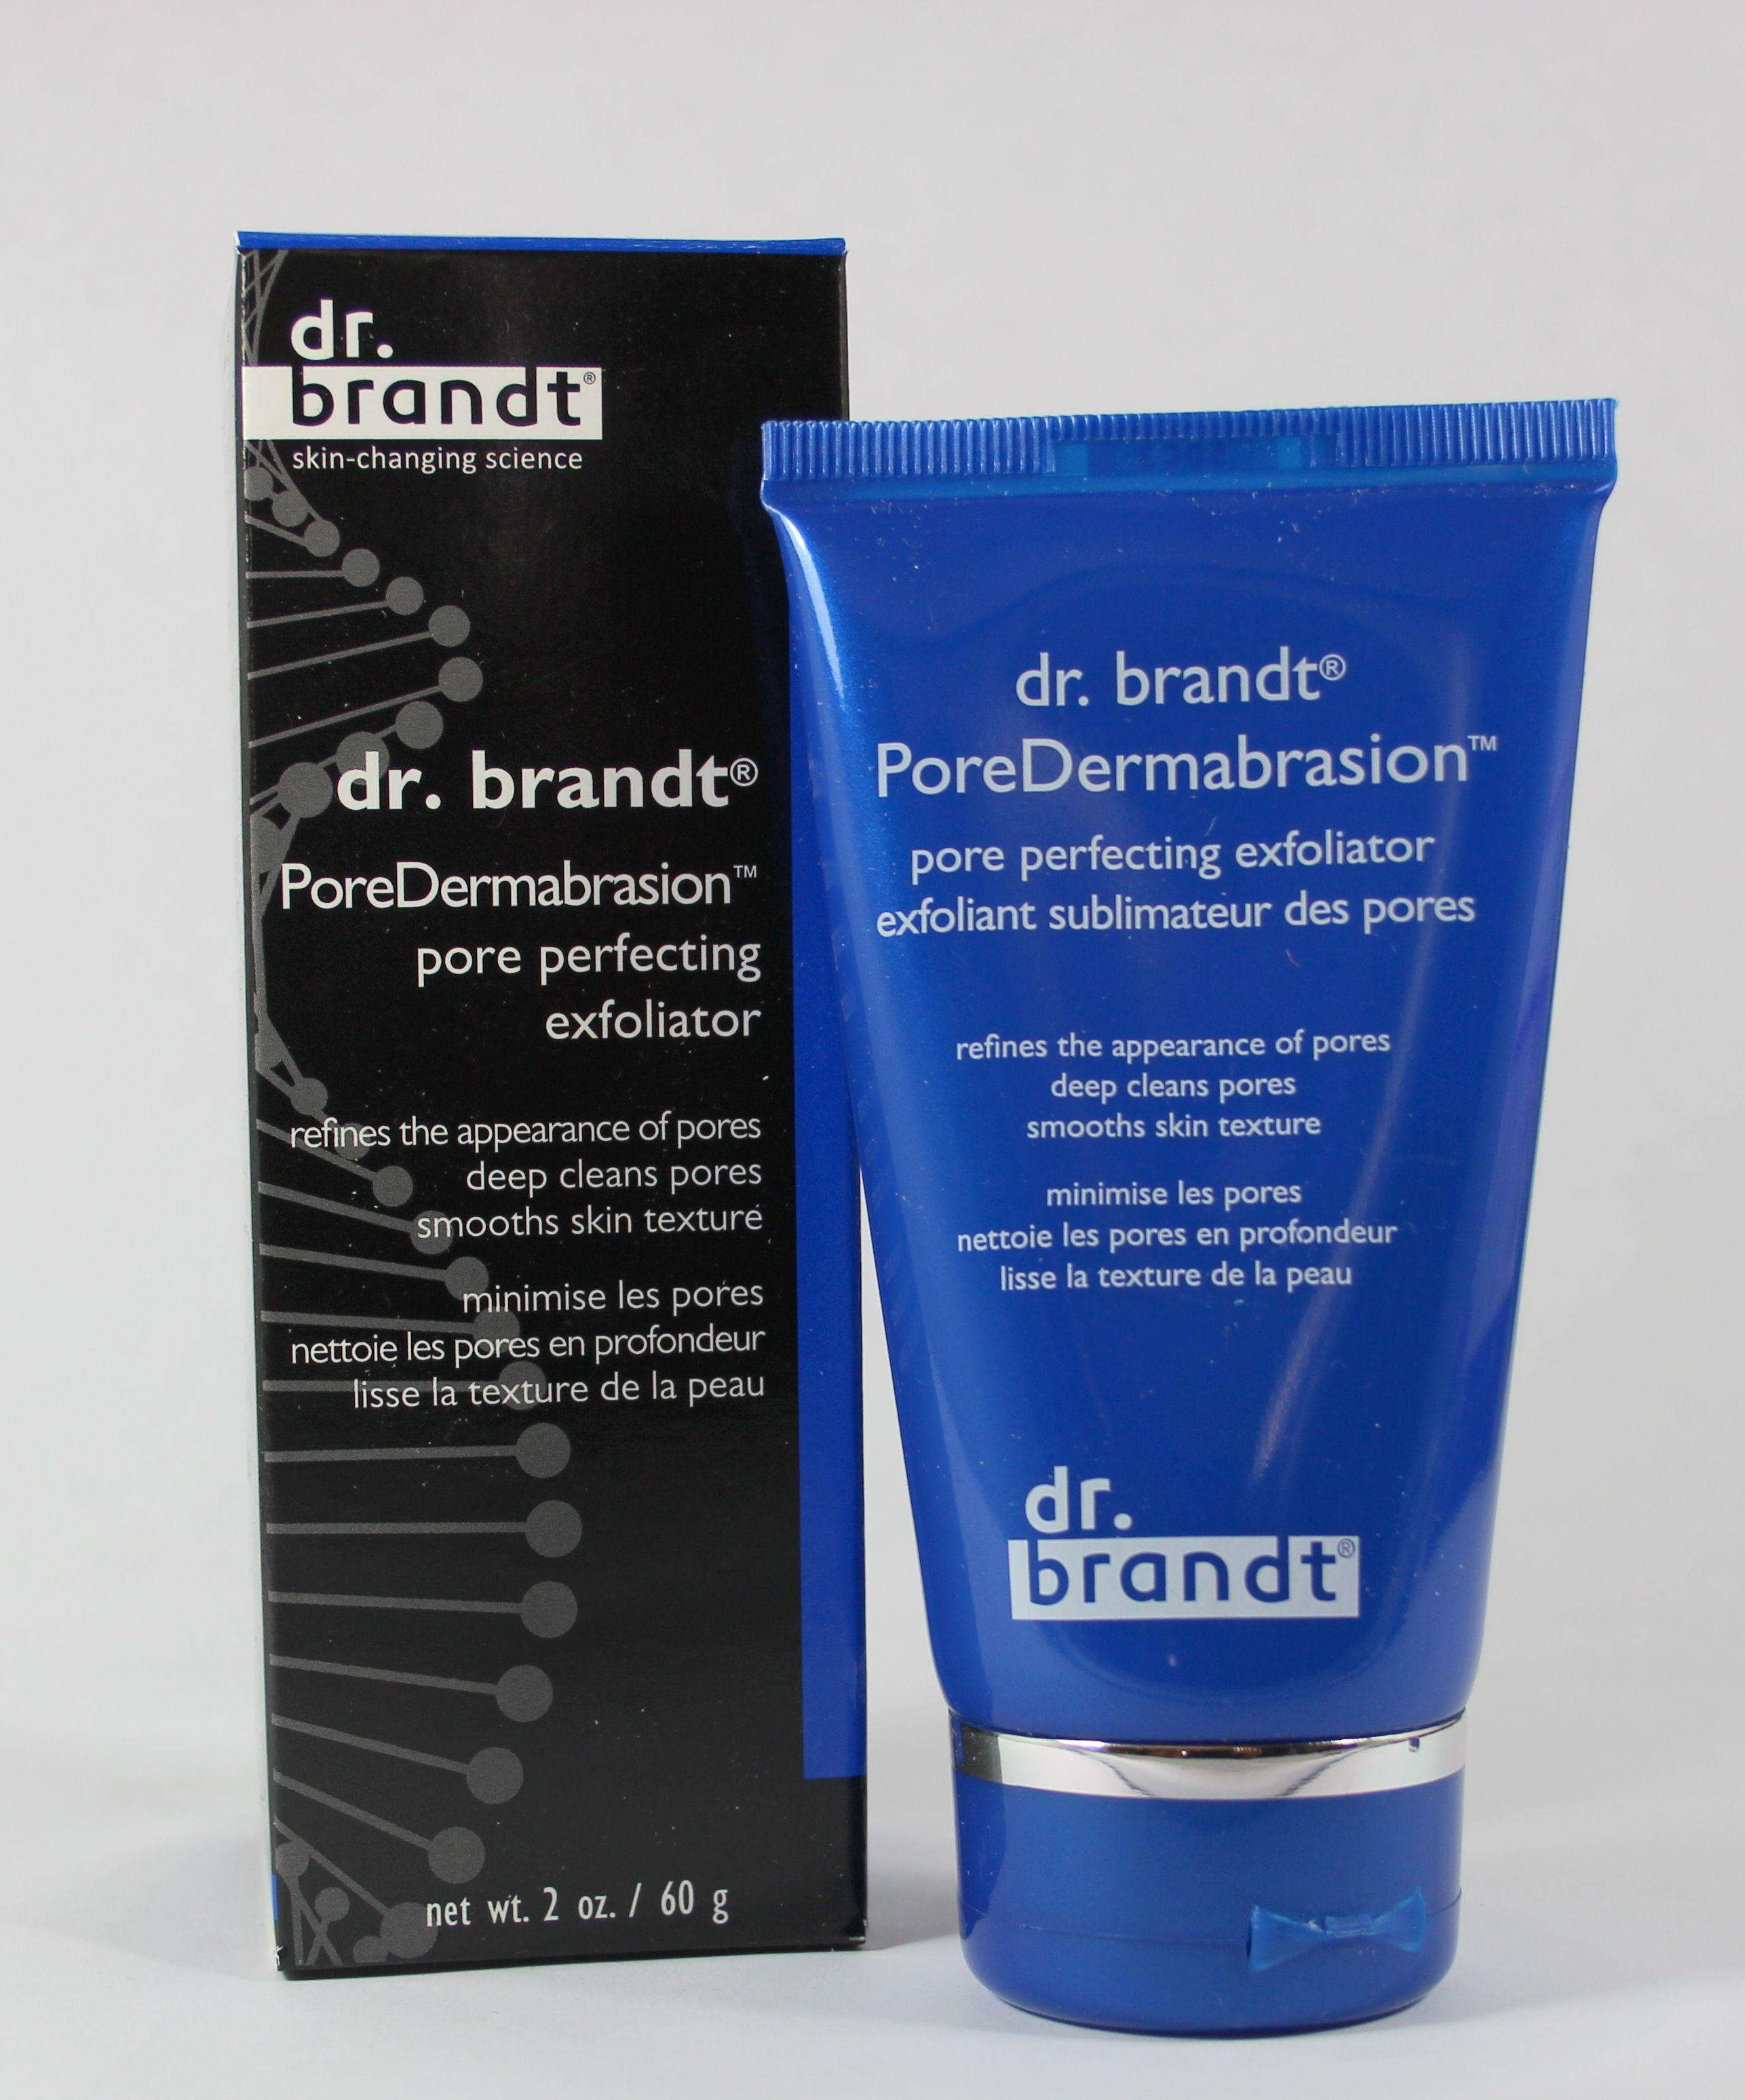 dr. brandt Pore Dermabrasion Review via @myhighestself #poredermabrasion #iFabboMember